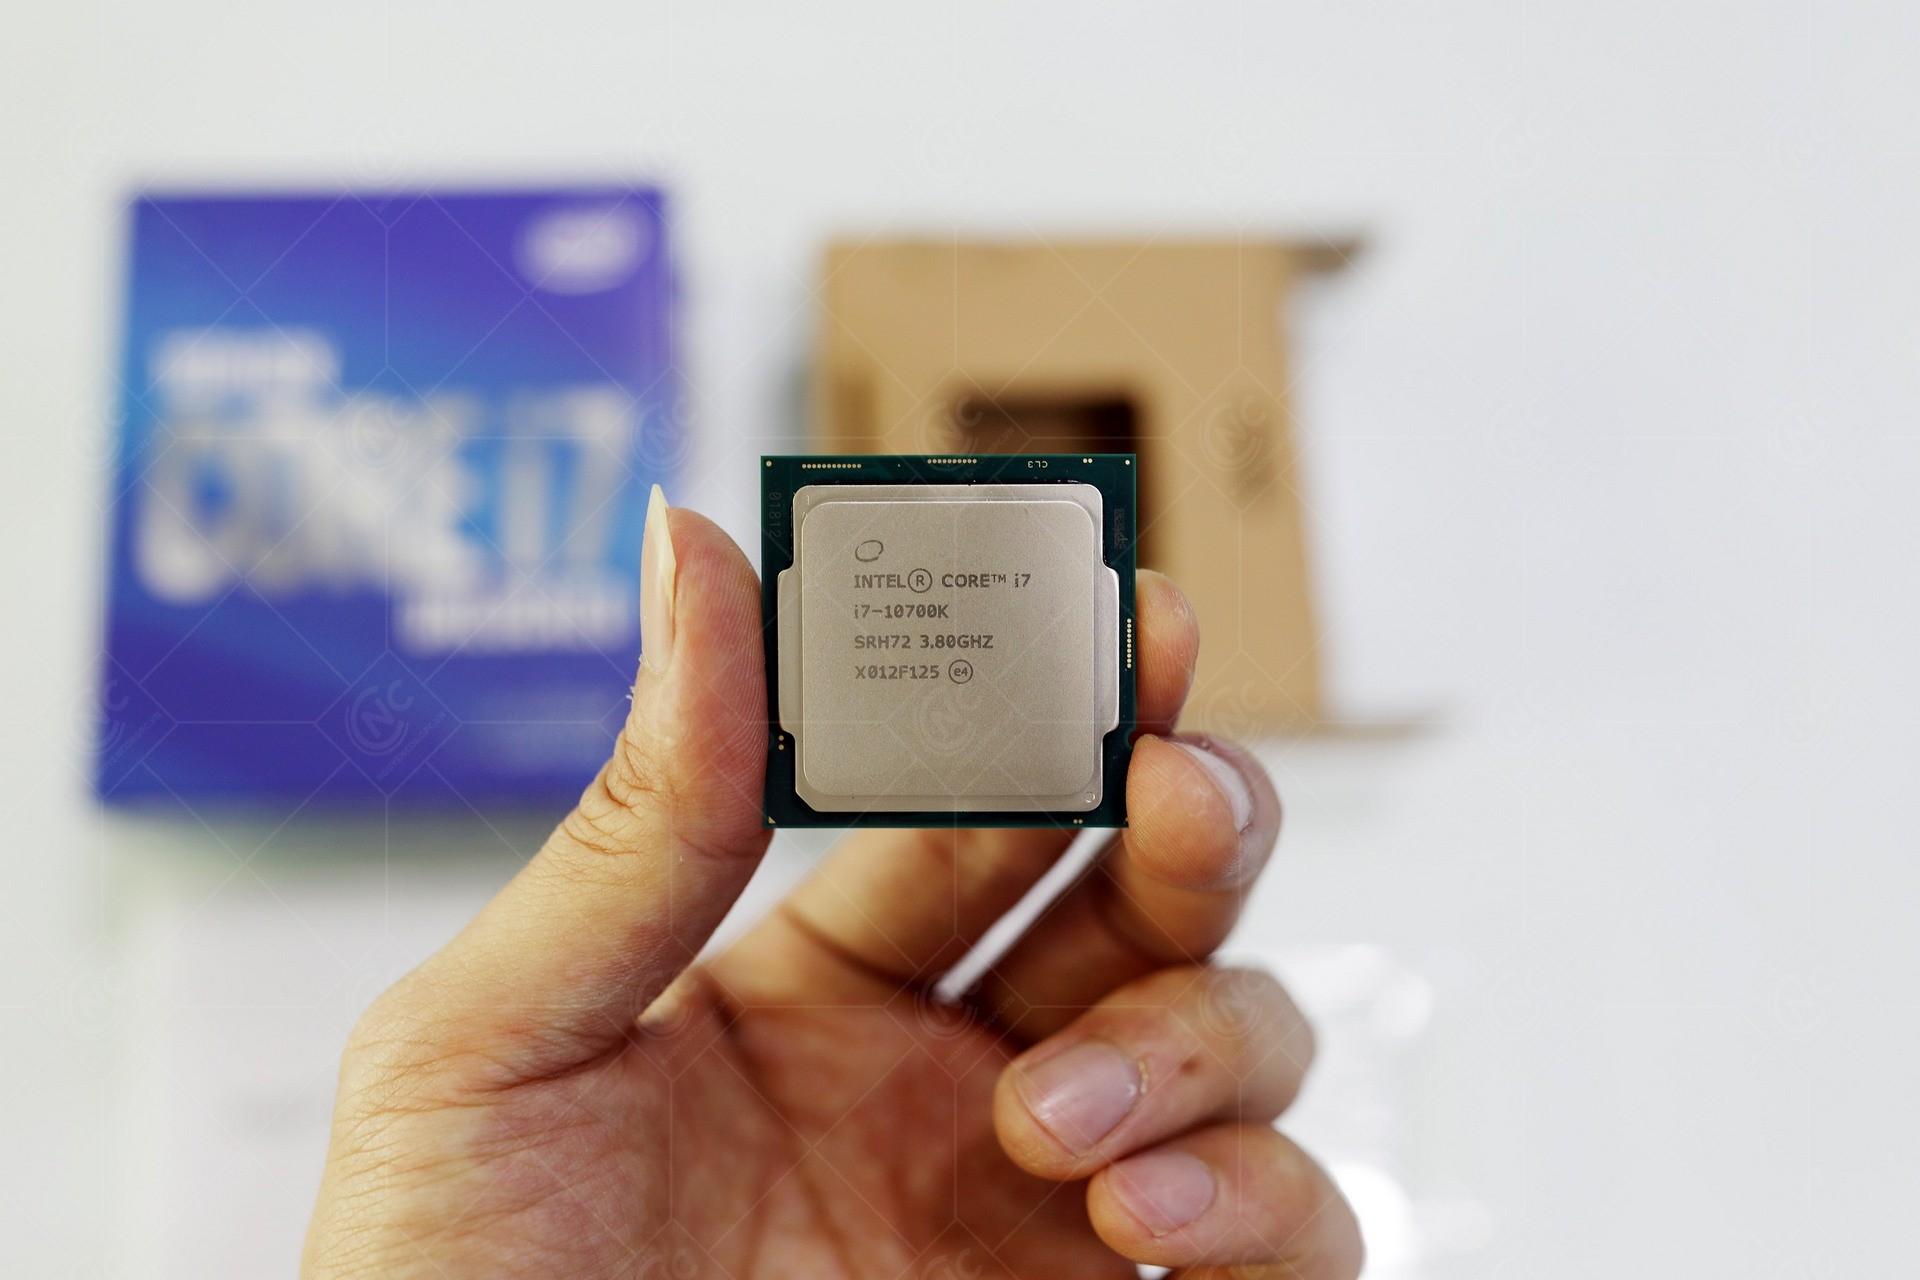 bo-pc-core-i7-10700k-ram-16g-vga-gtx-1650-4g